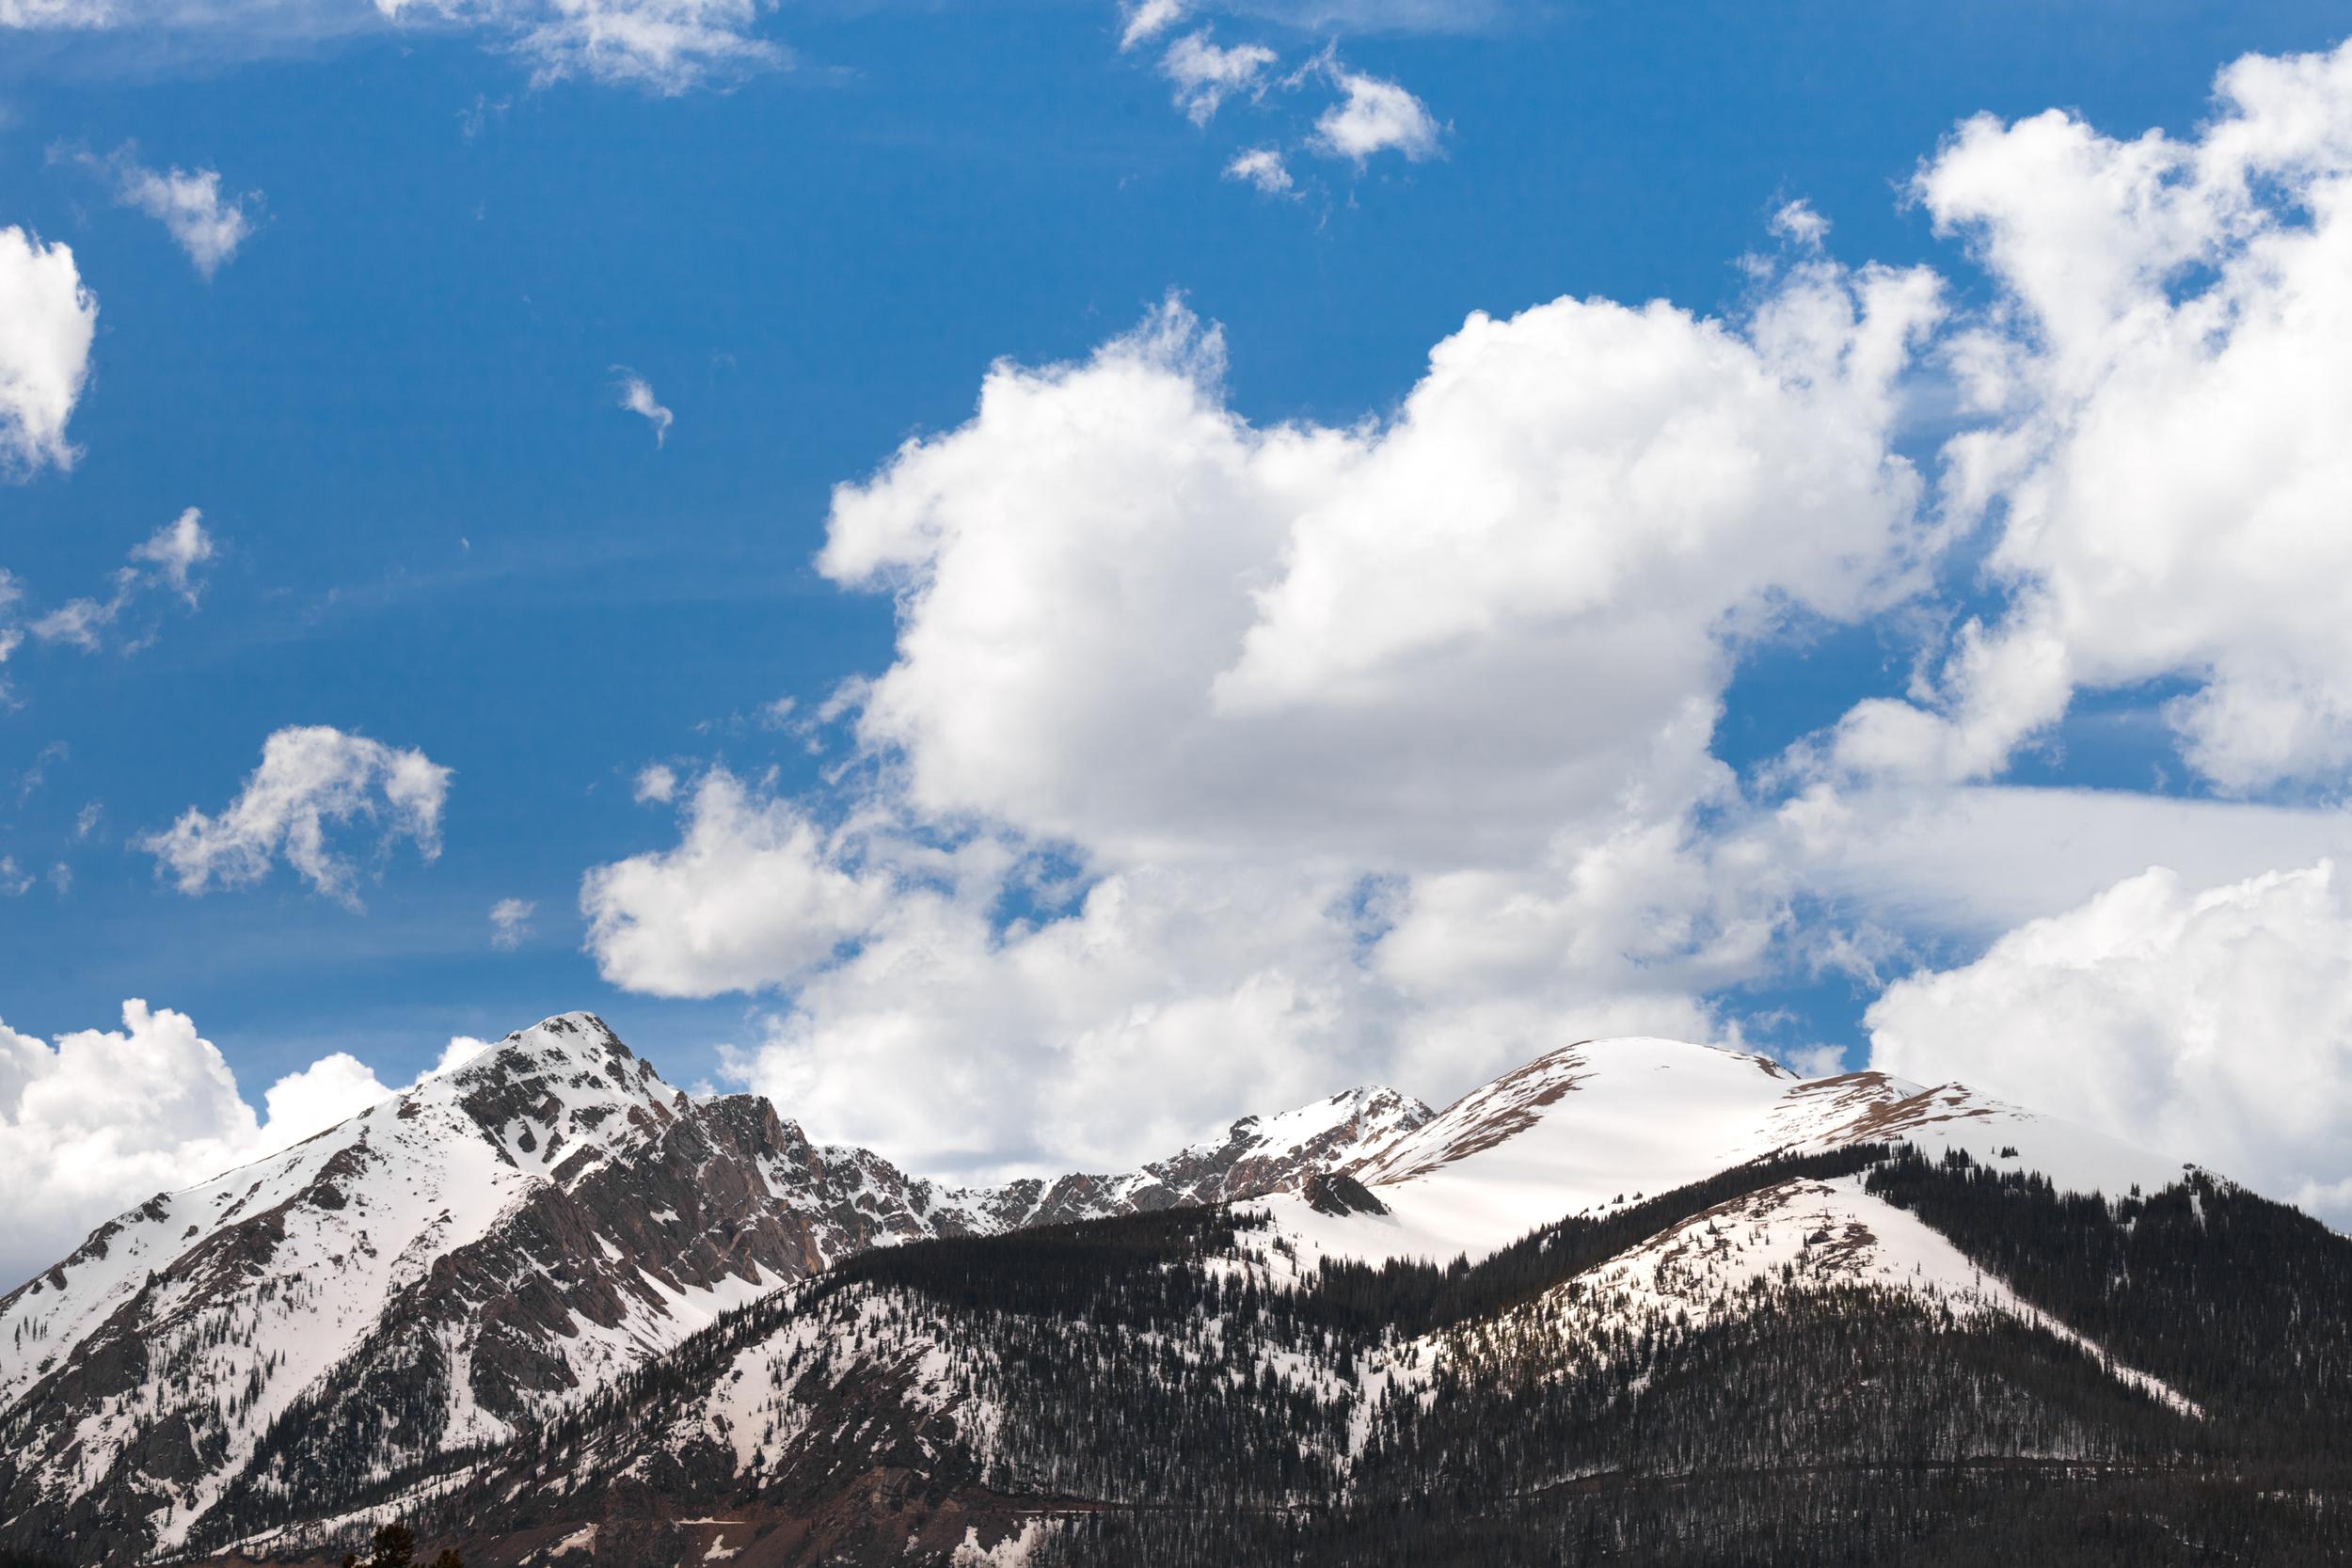 Colorado_day3-2337-HDR-2.jpg